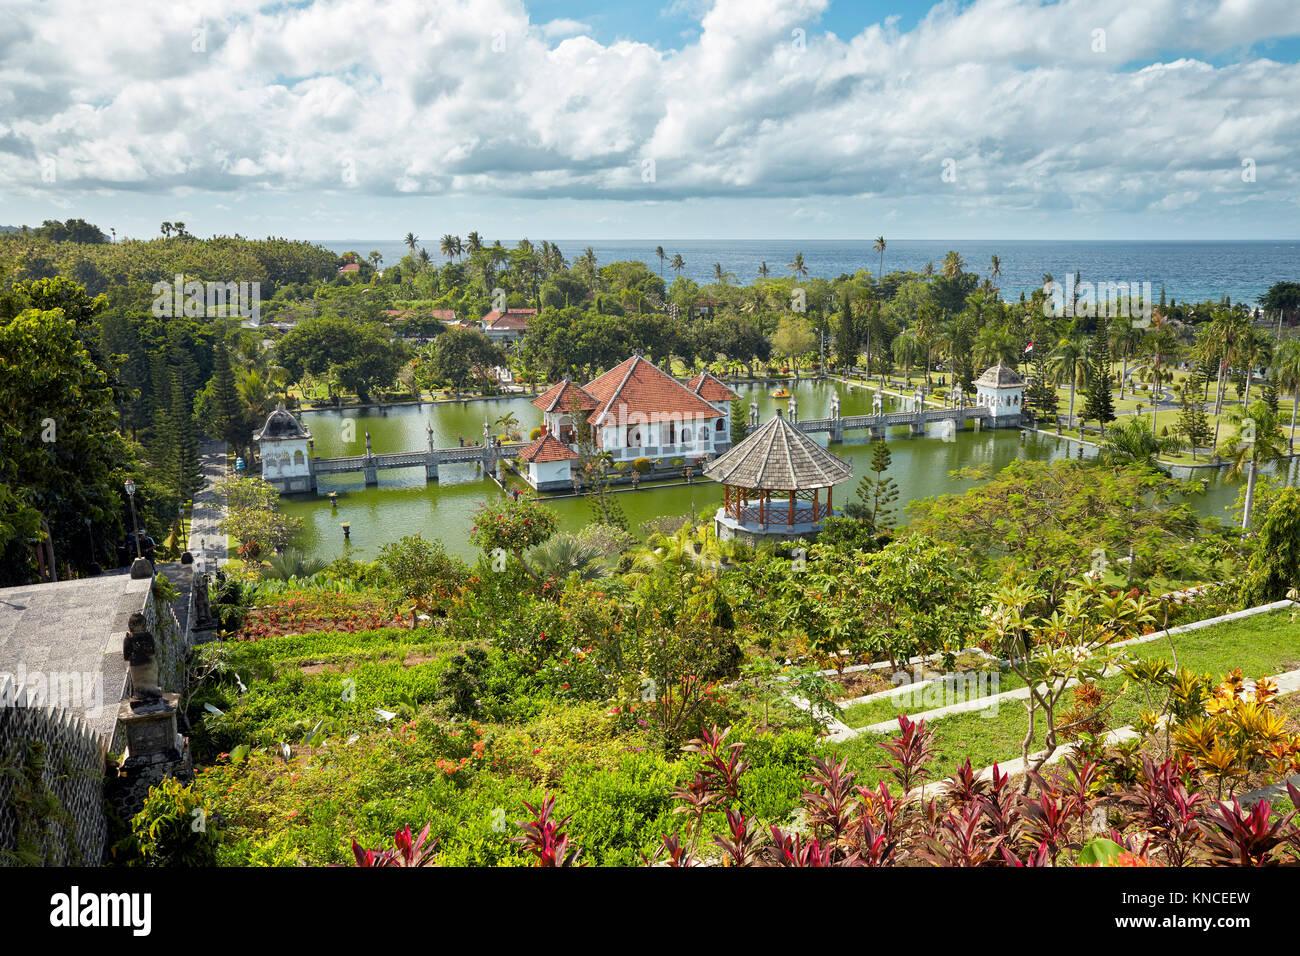 Elevetaed view of Ujung Water Palace (Taman Ujung), also known as Sukasada Park. Karangasem Regency, Bali, Indonesia. - Stock Image